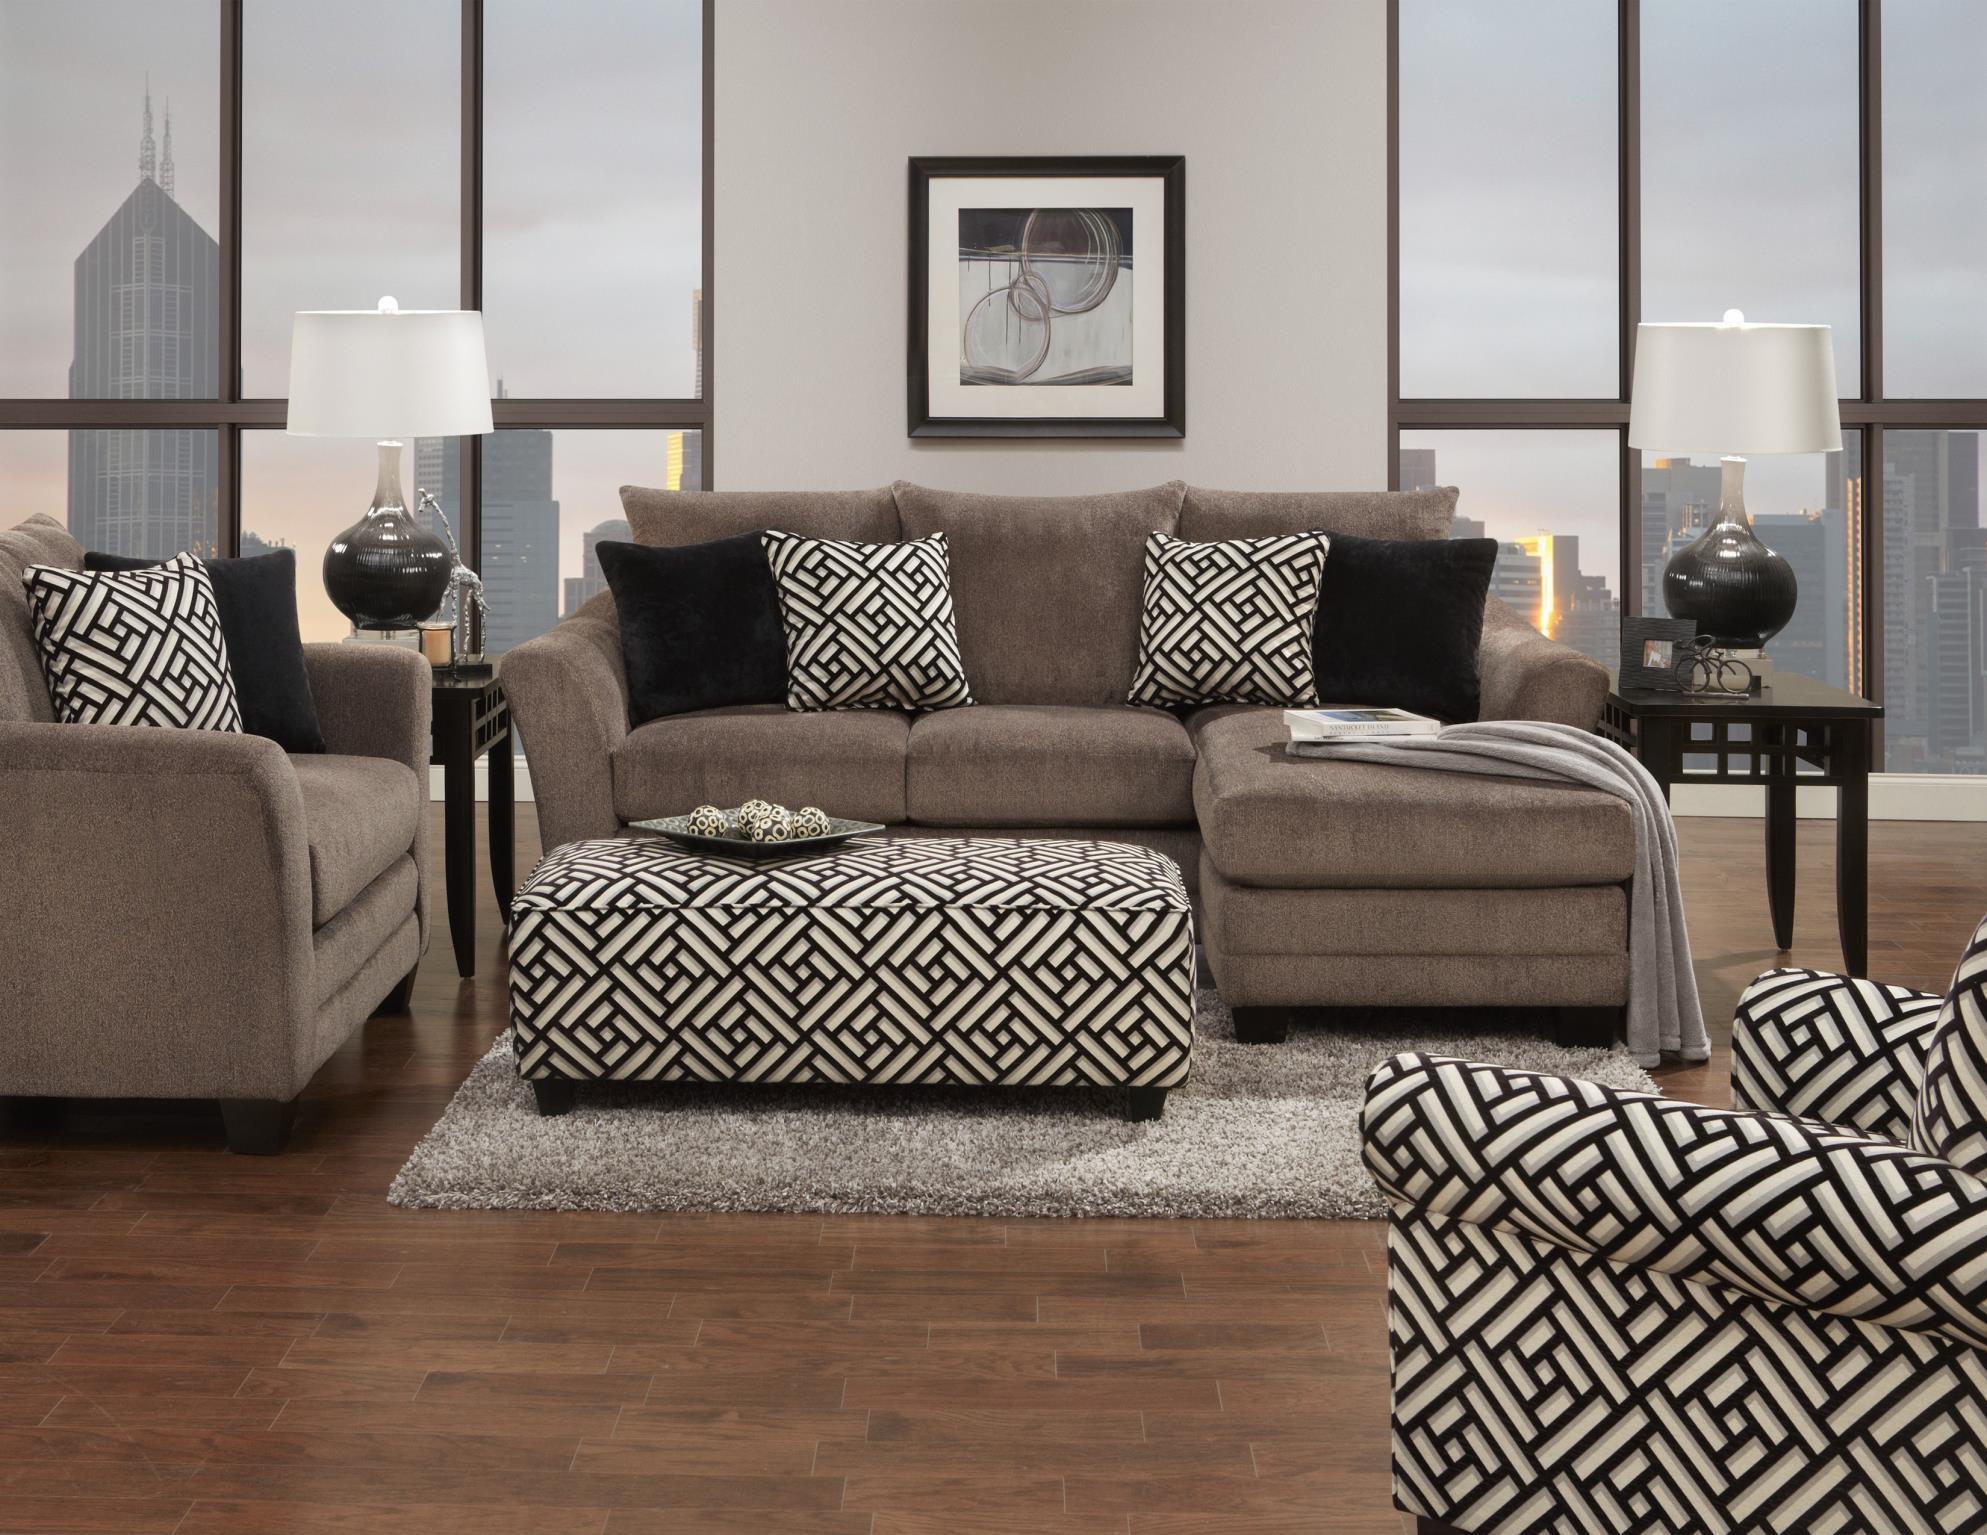 Furniture: Best Pilgrim Furniture City For Inspiring Your in Pilgrim Furniture Manchester Ct